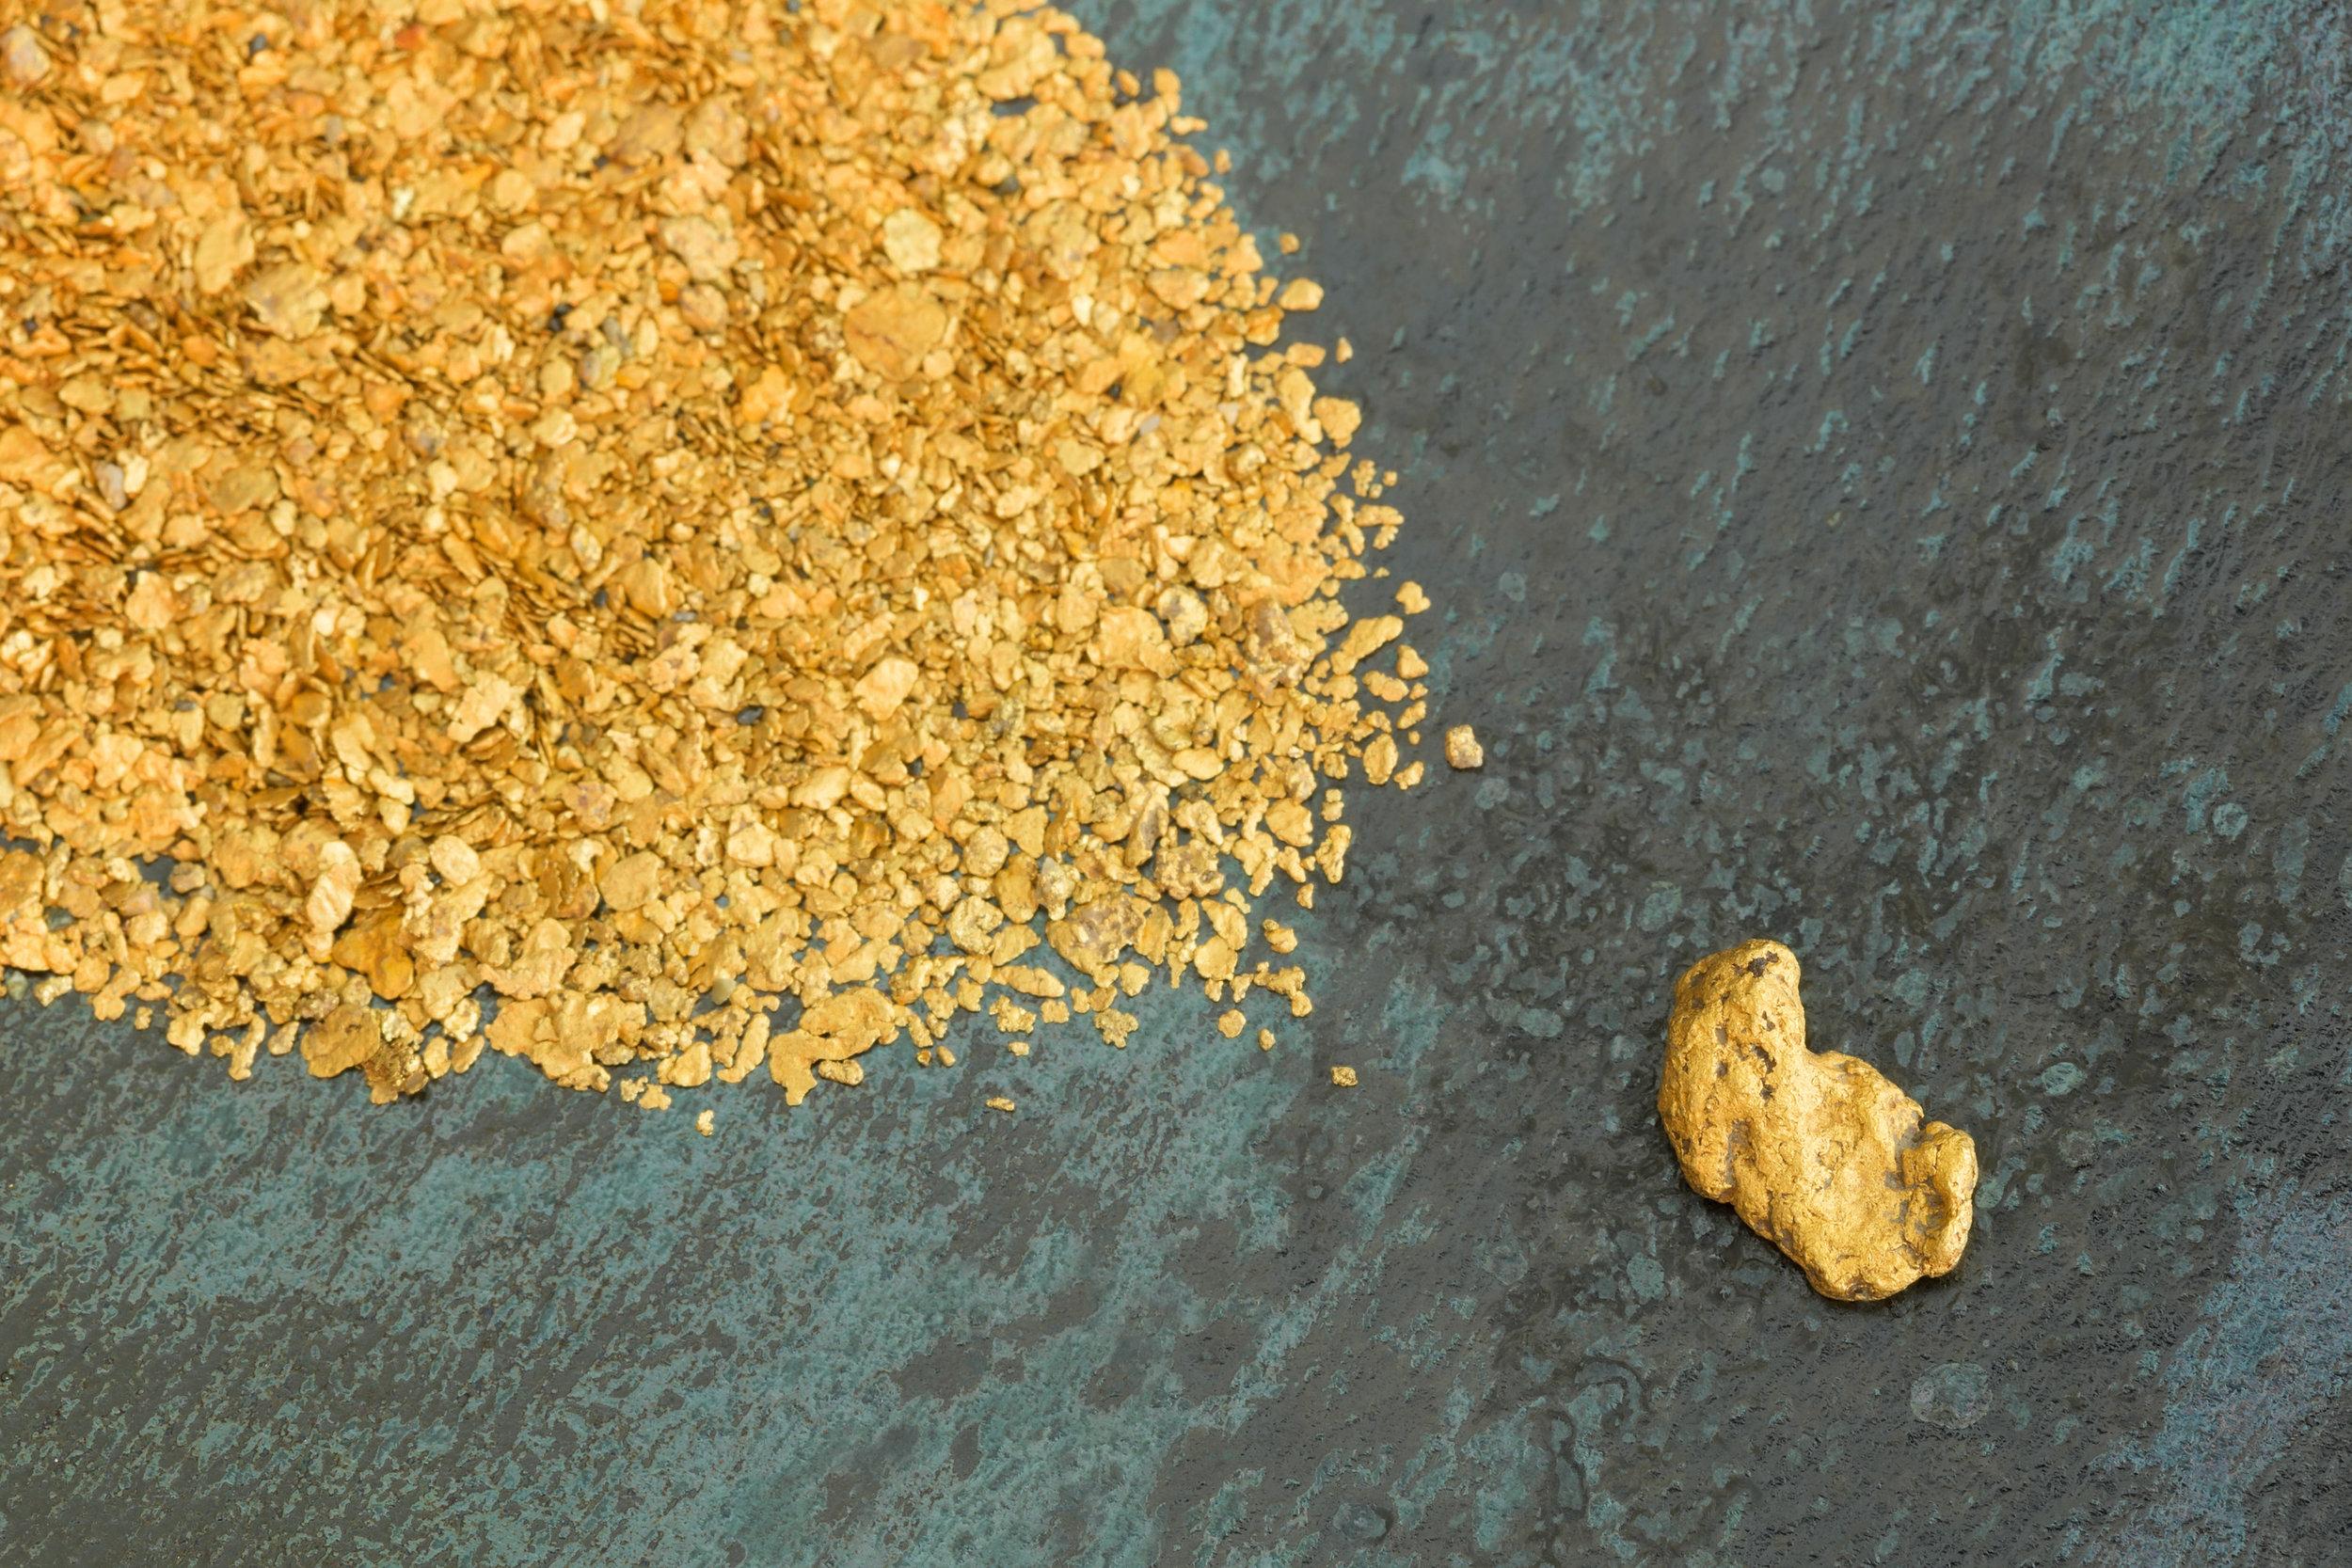 photodune-3411454-natural-placer-gold-l.jpg